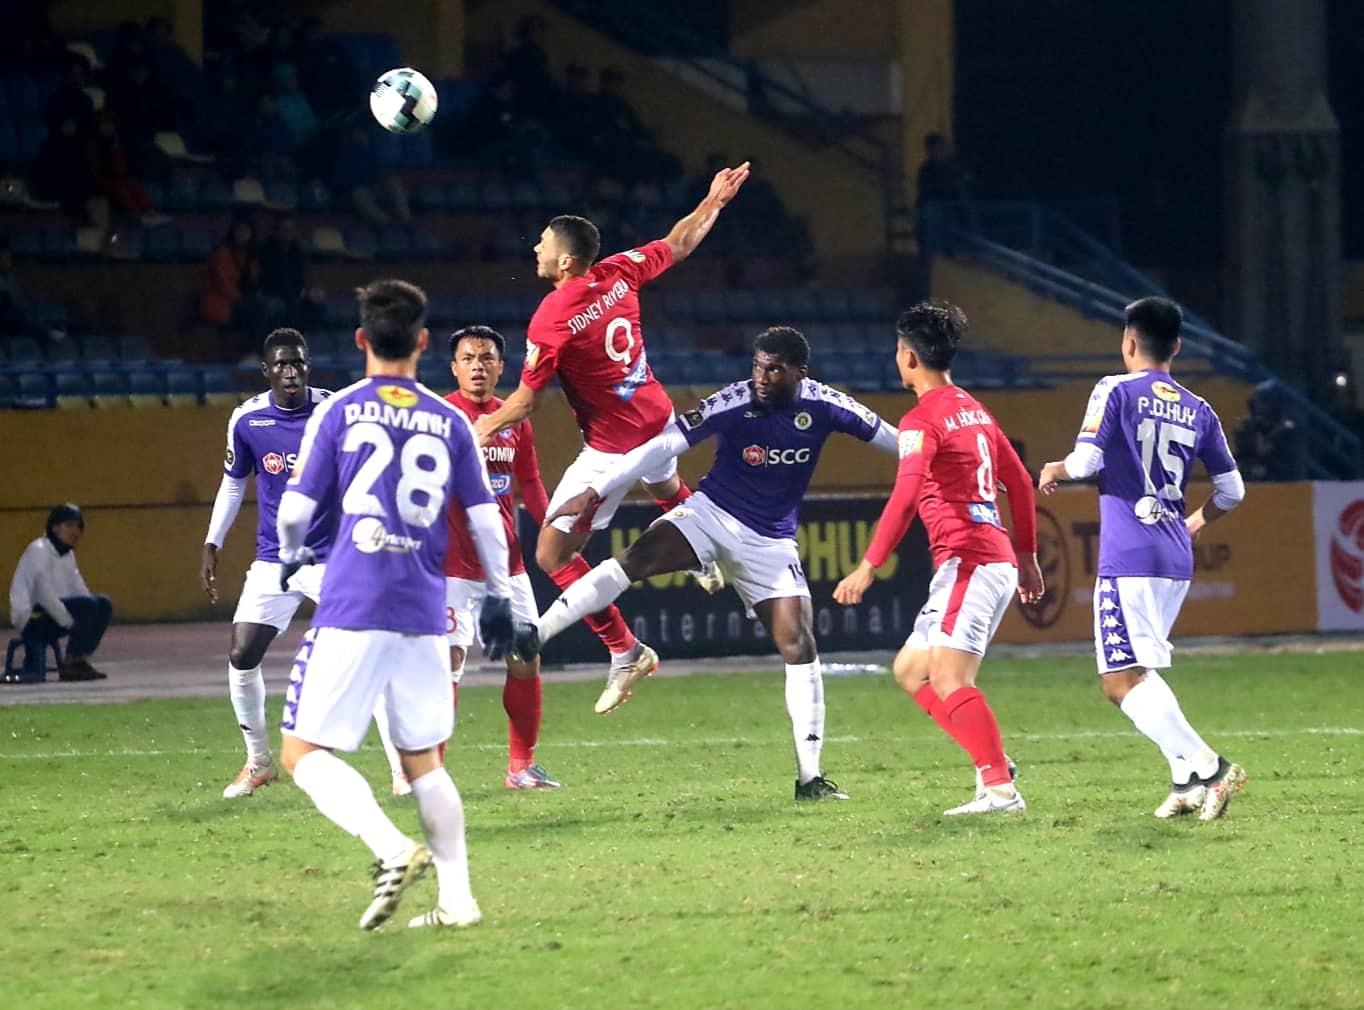 Sidney Rivera Ha Noi vs Than Quang Ninh V.League 2019